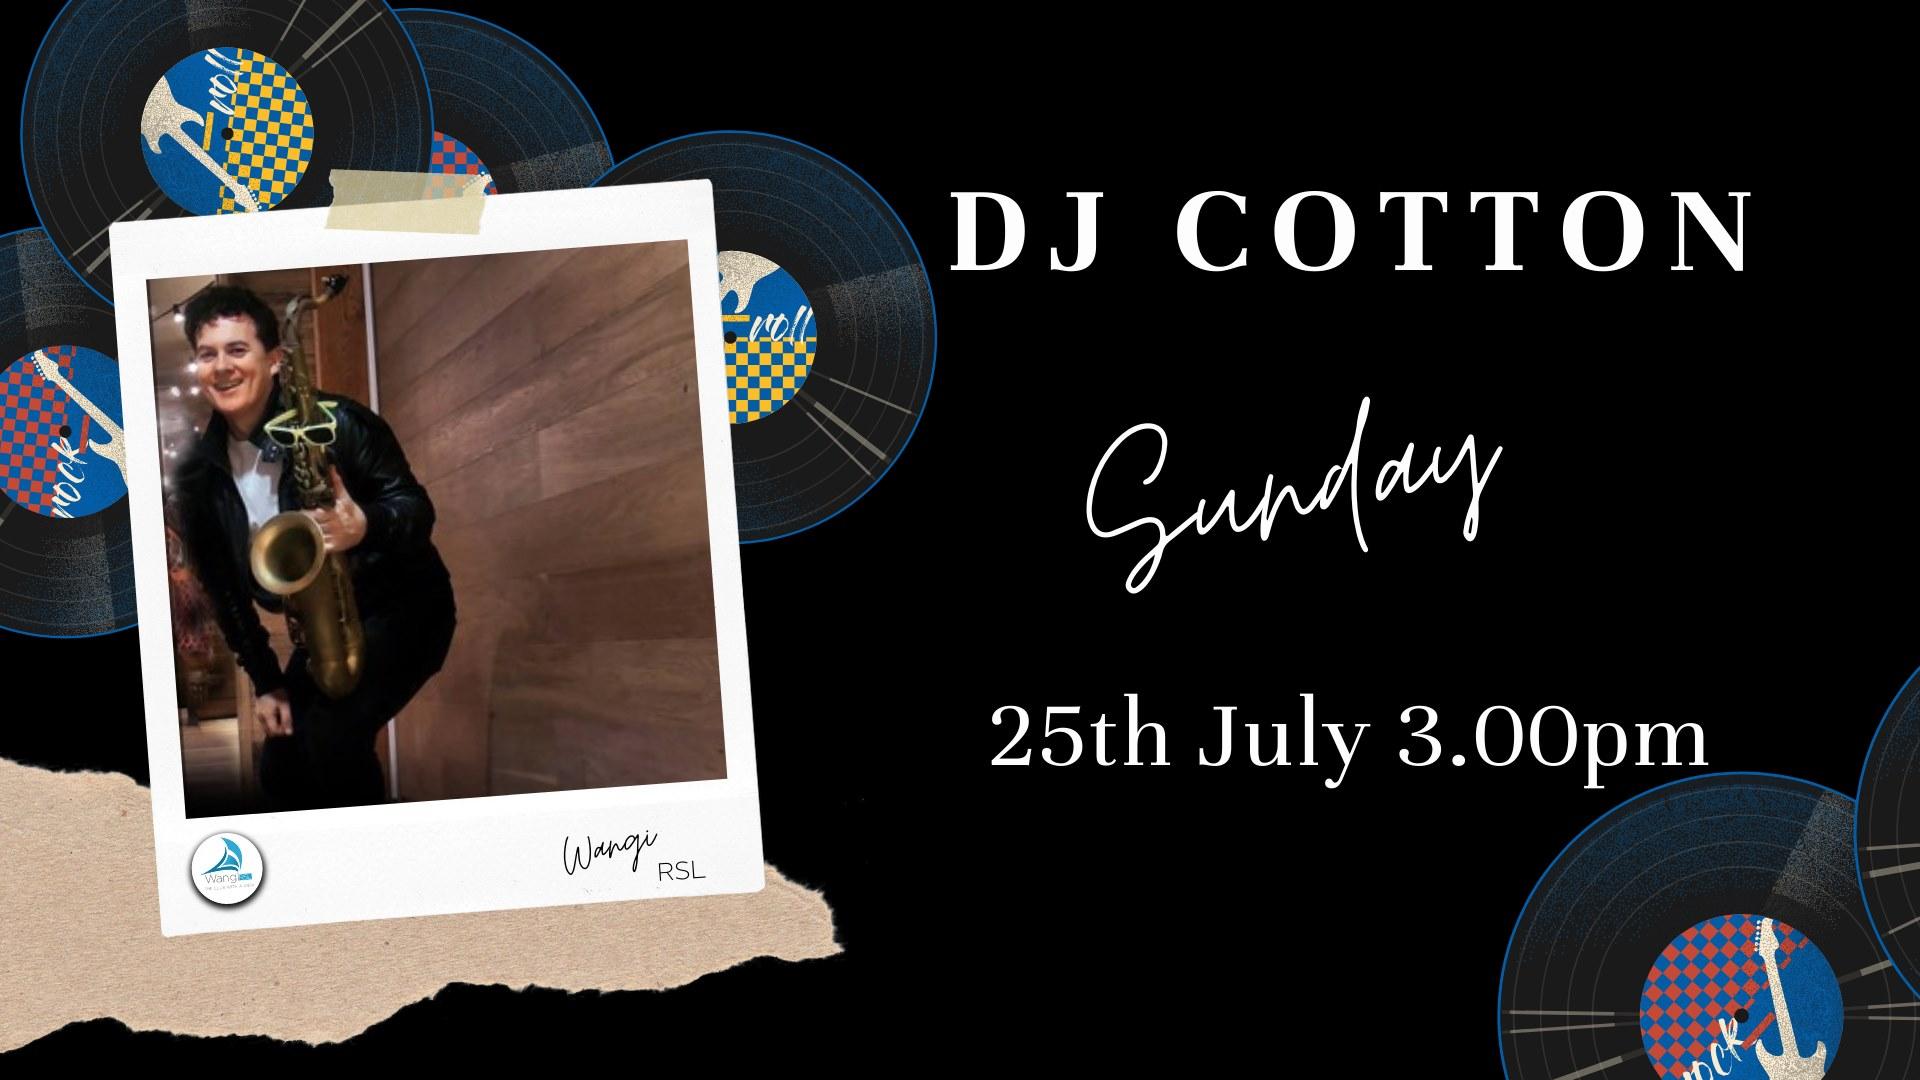 DJ Cotton